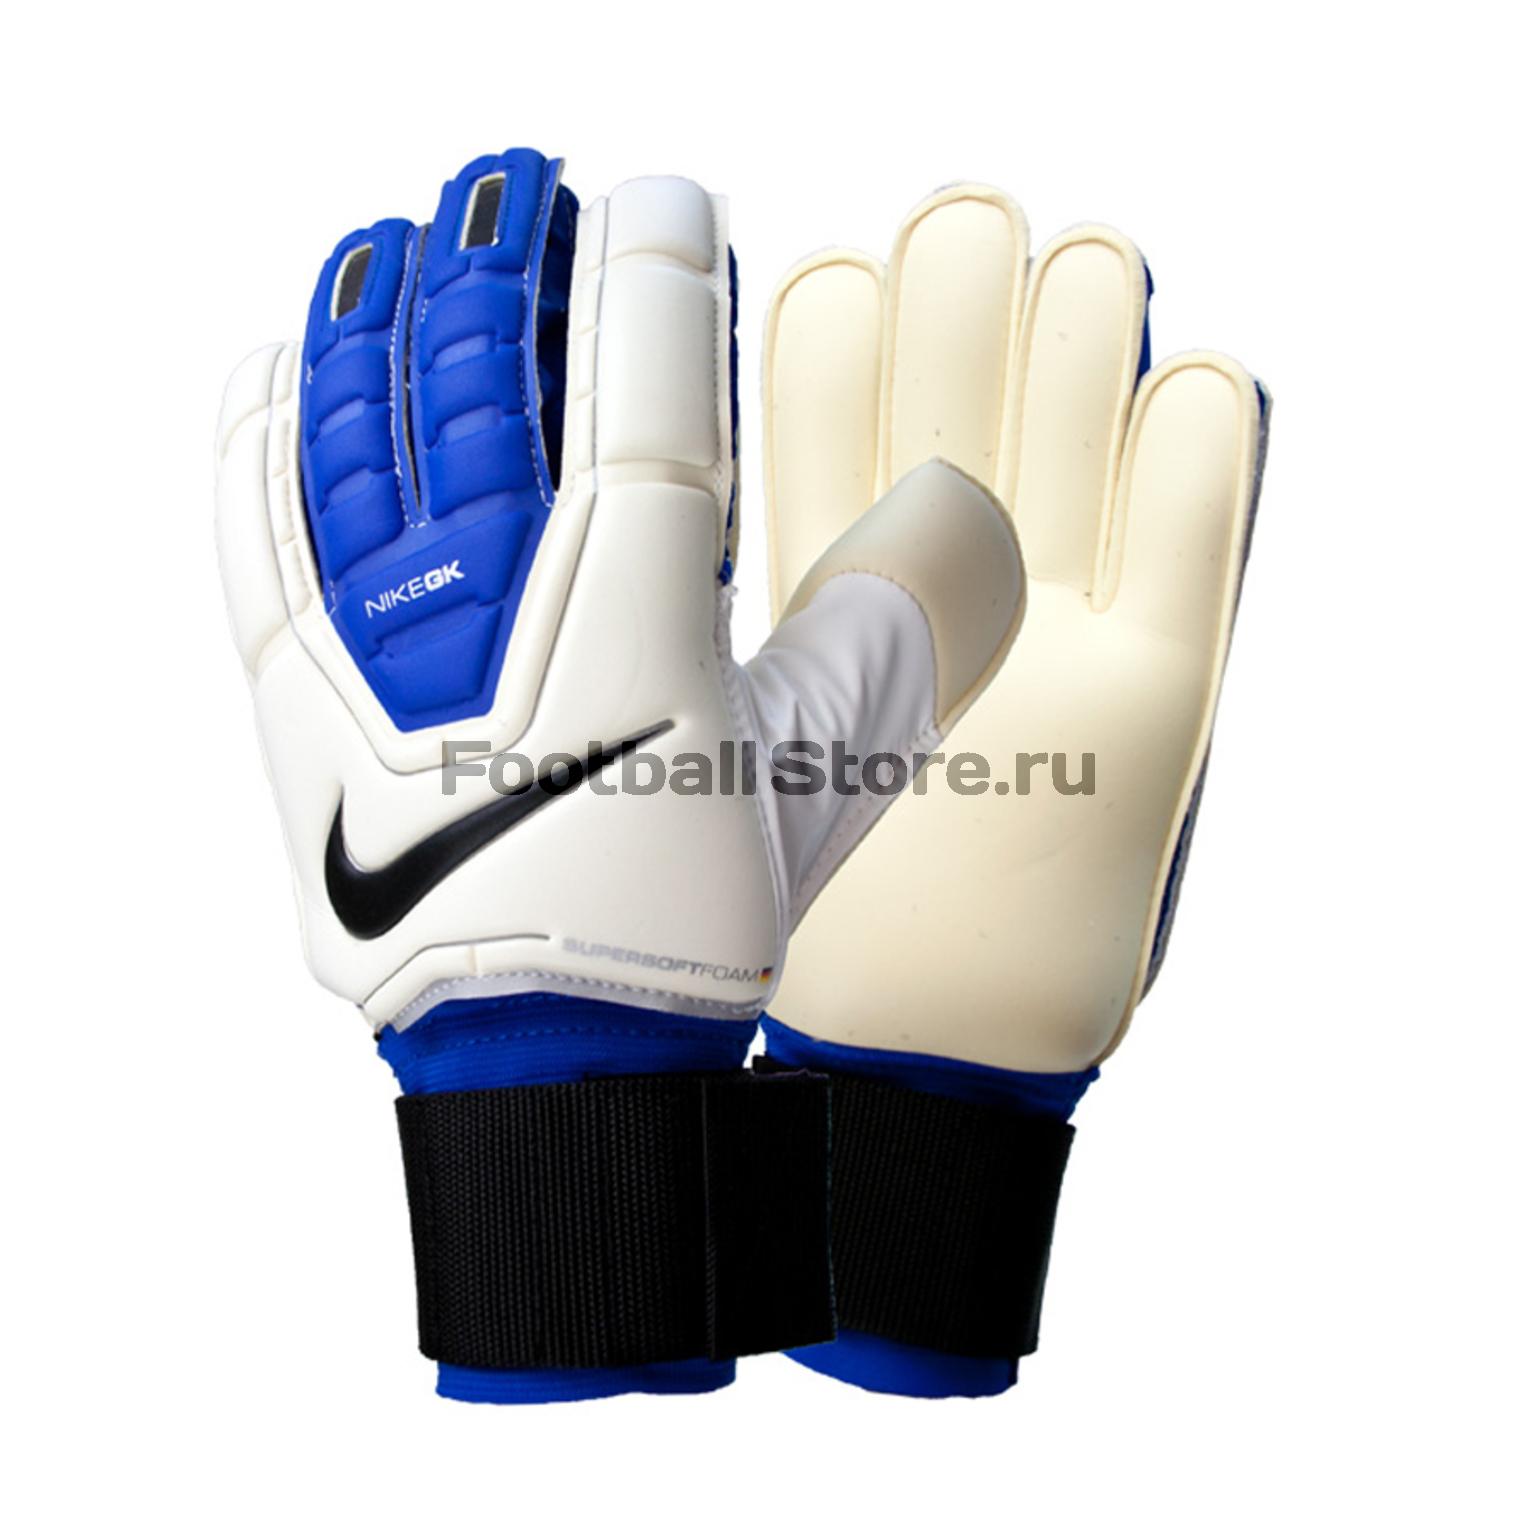 Перчатки Nike Вратарские перчатки Nike GK Spyne Pro GS0230-140